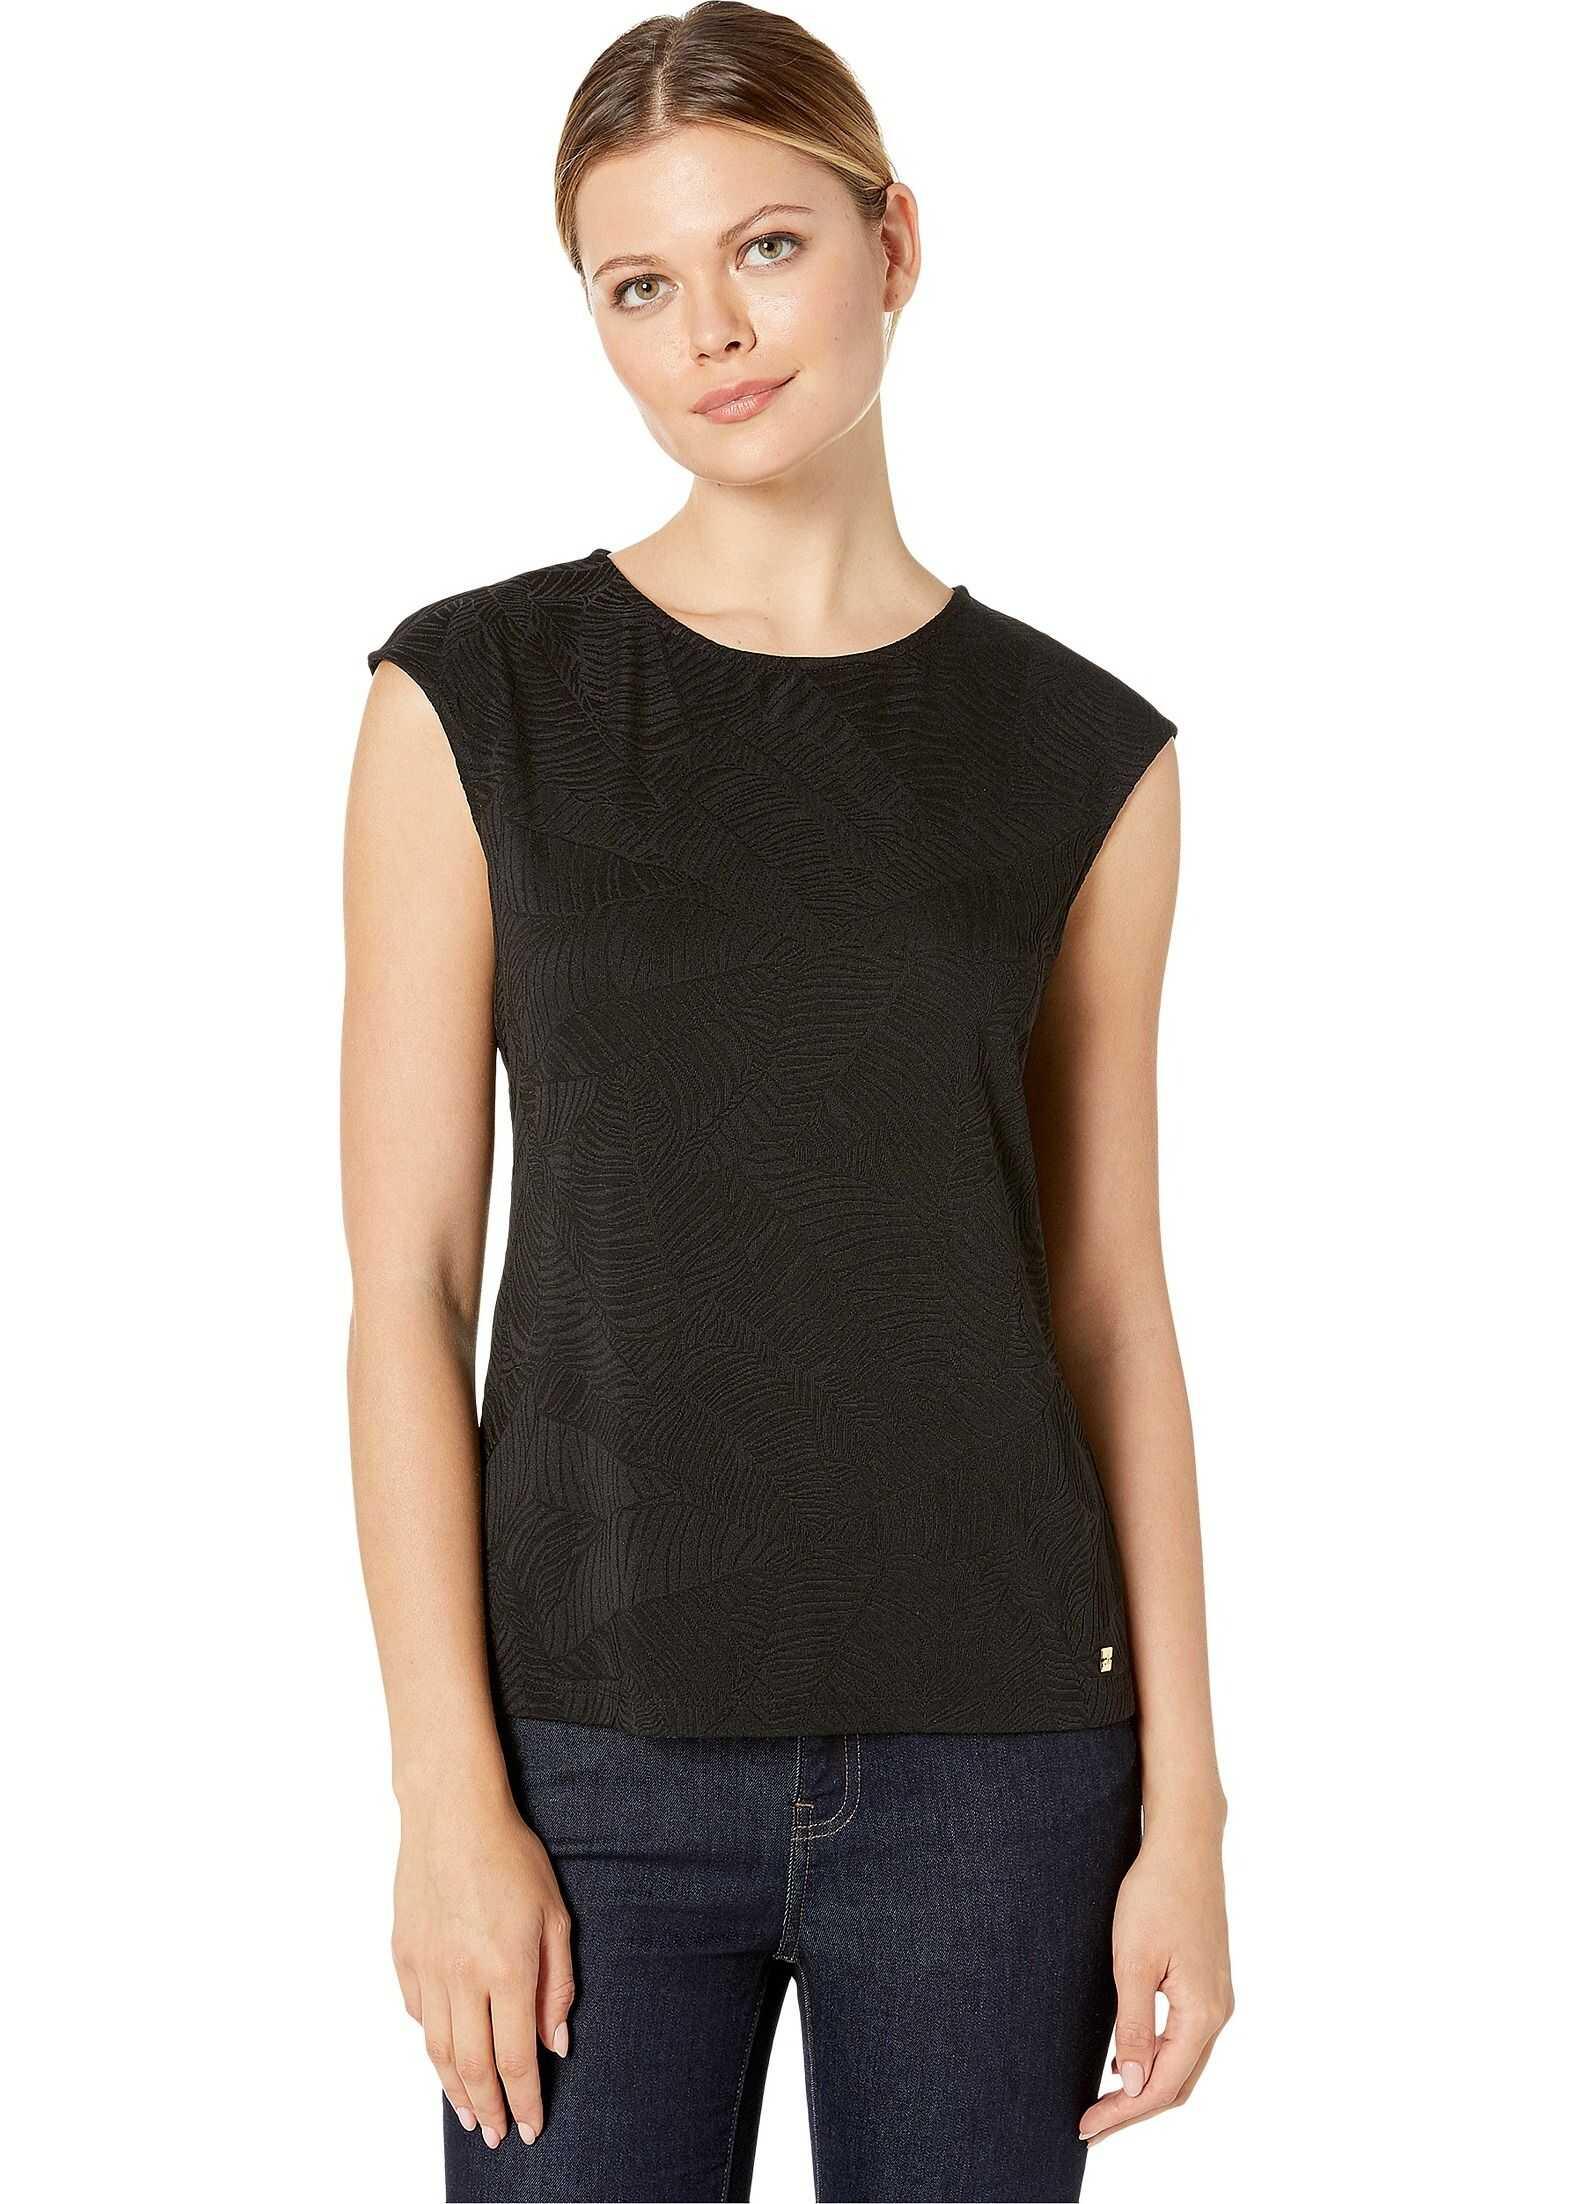 Calvin Klein Texture Cap Sleeve Knit Black/Black